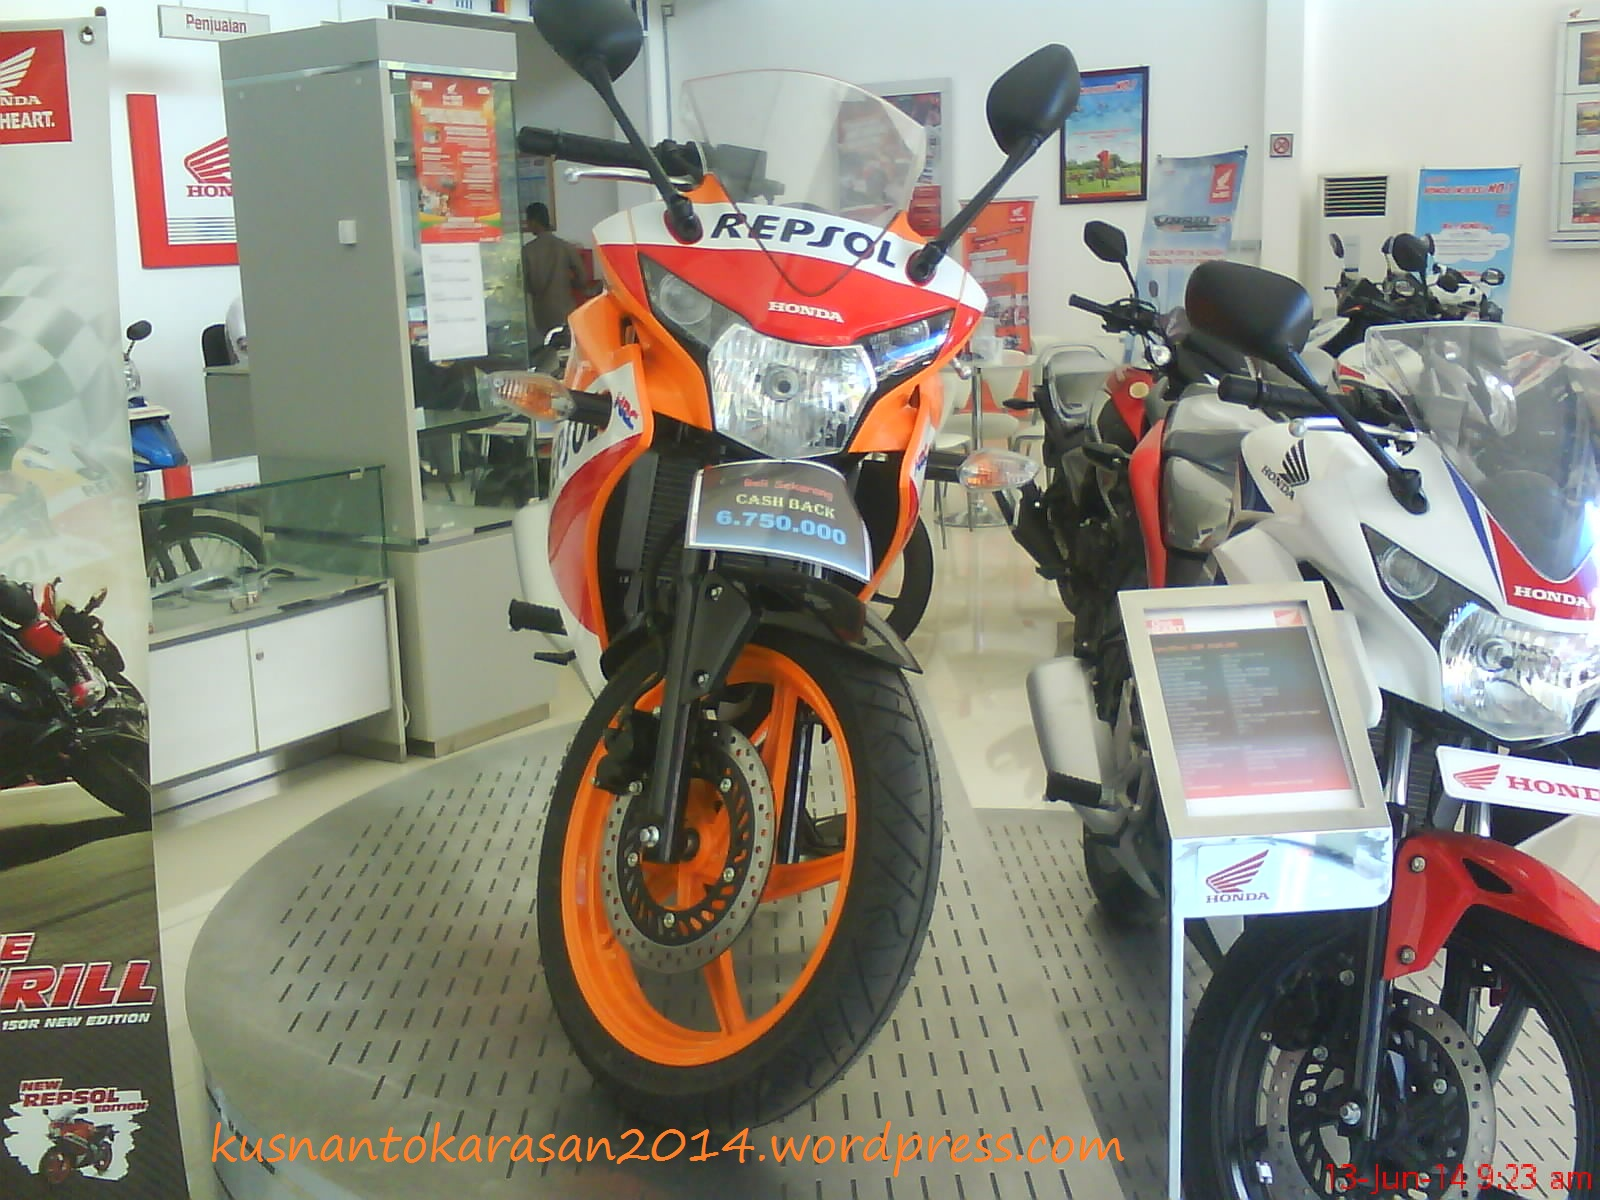 December 2014 Page 3 All New Cb 150r Streetfire Honda Racing Red Kab Semarang Tampak Depan Cbr Edisi Repsol Produk Import Thailand